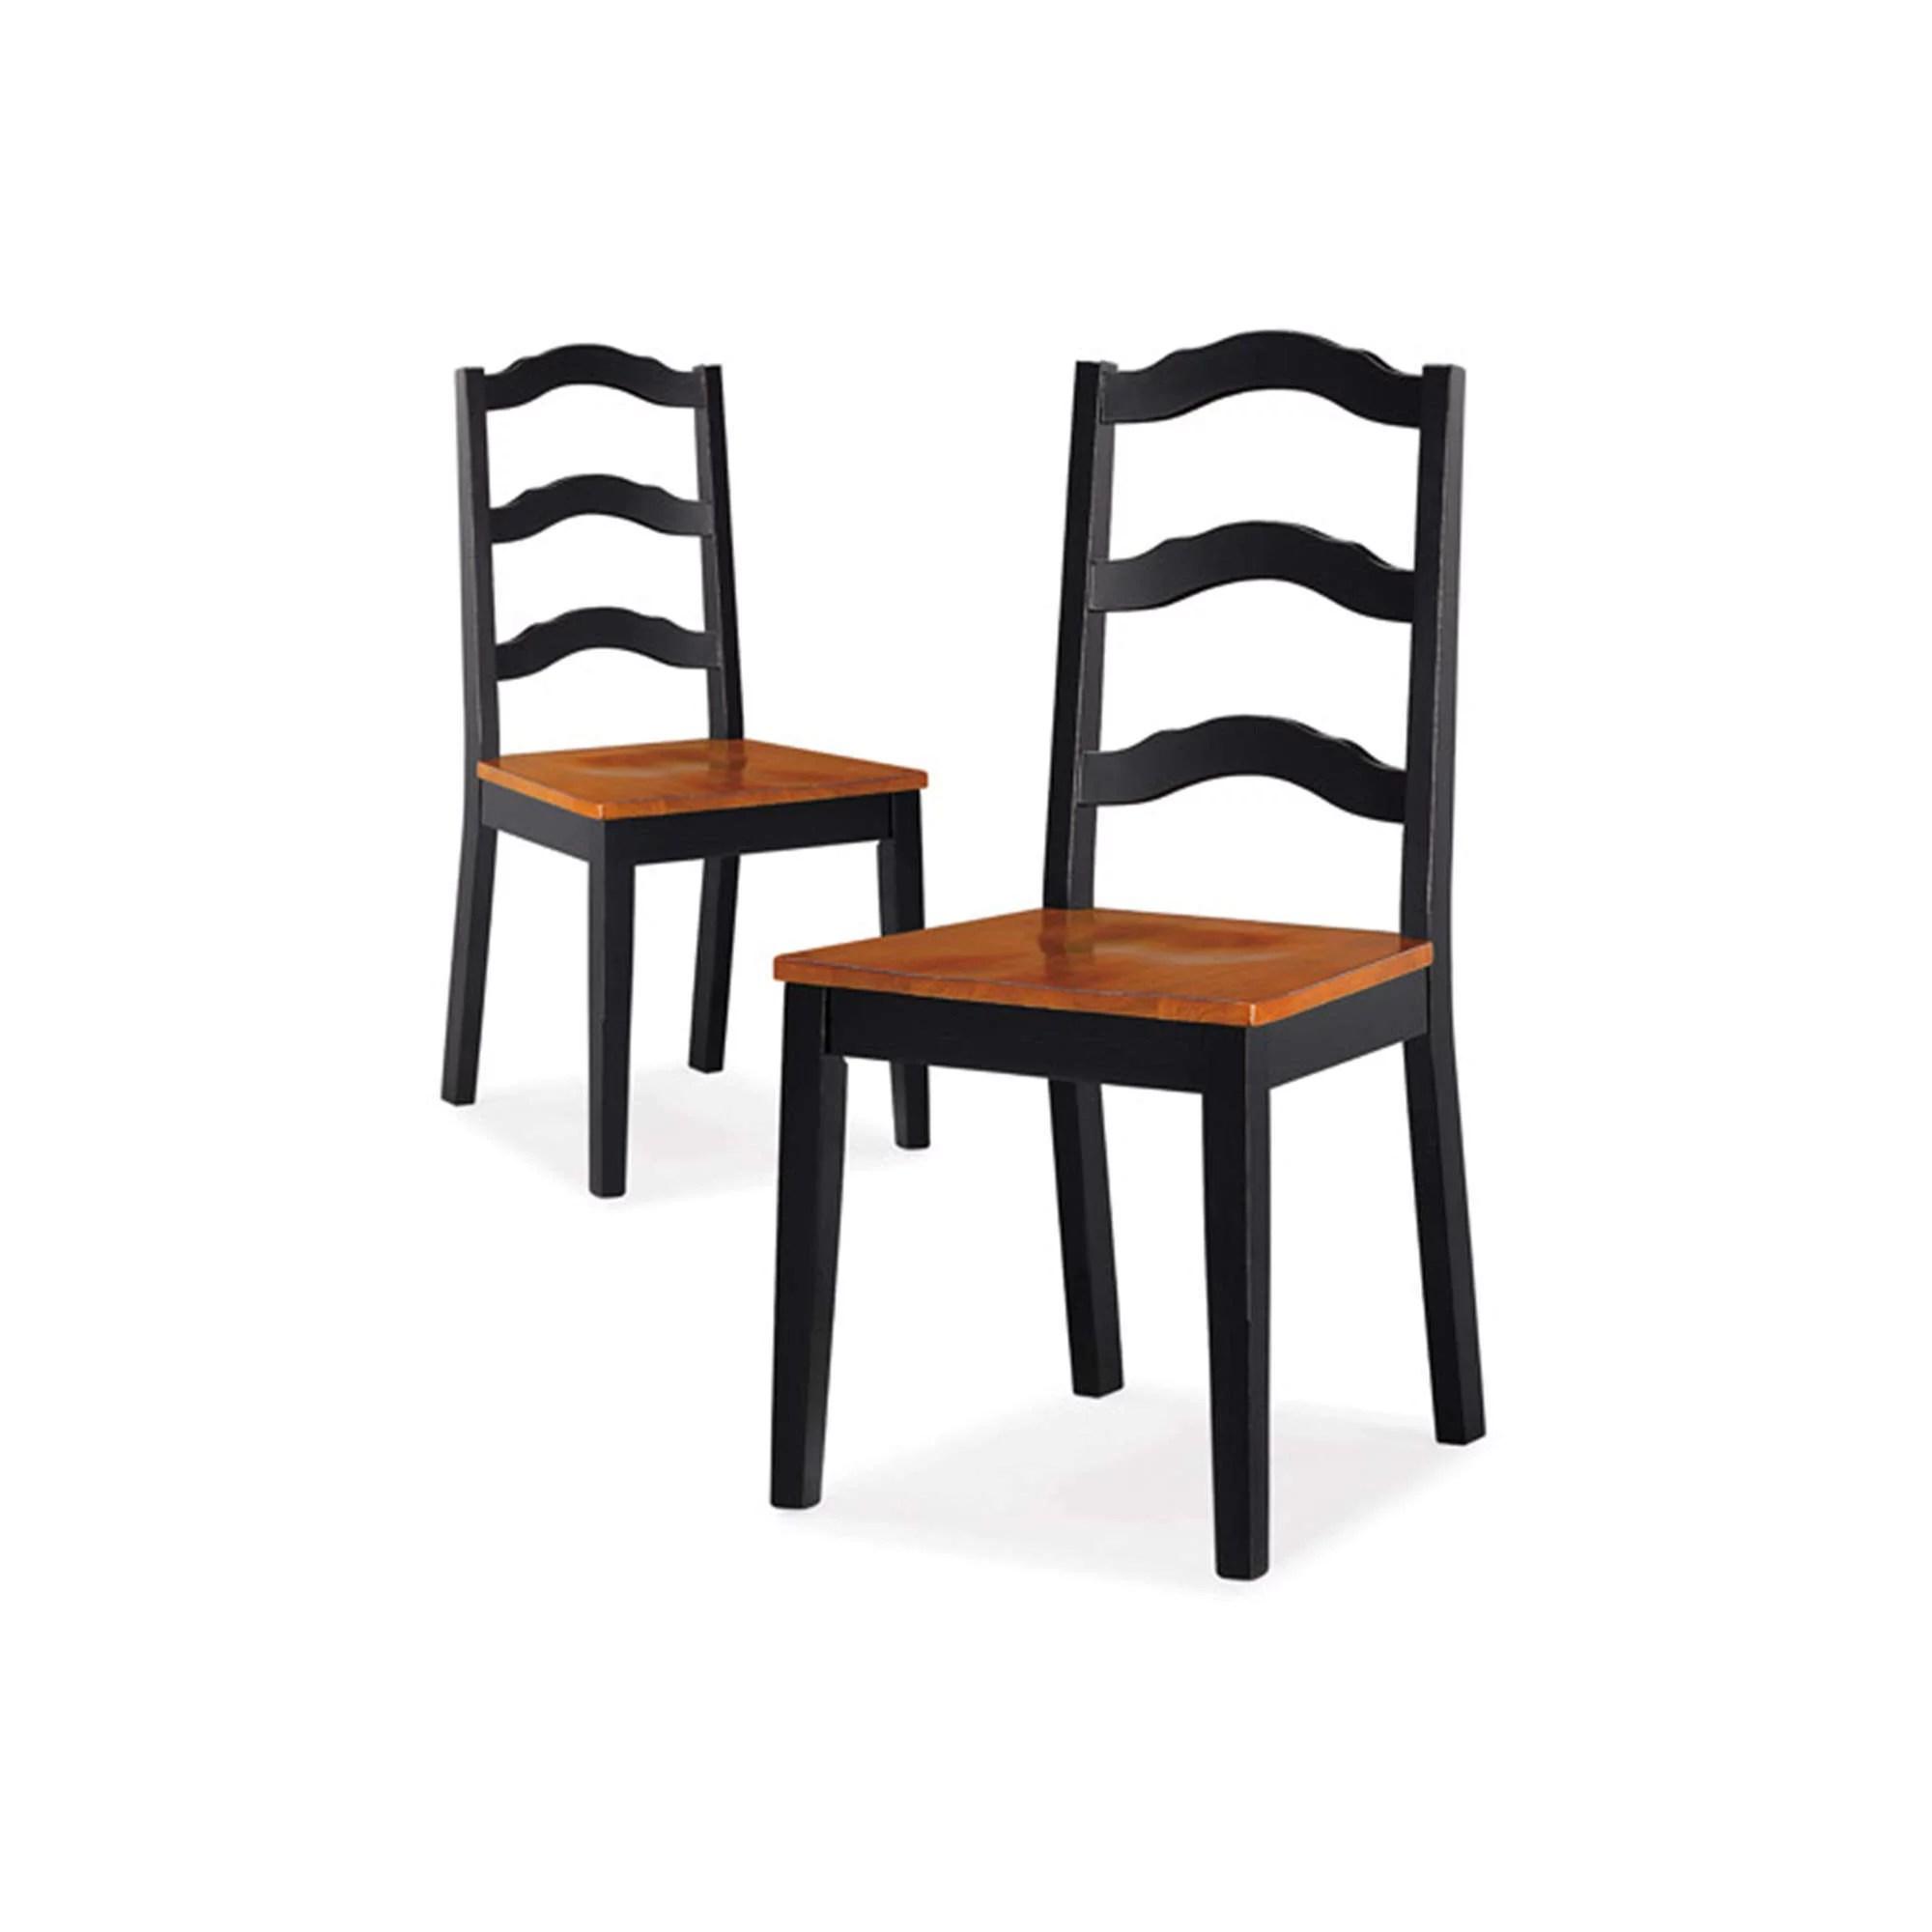 Better Homes And Gardens Autumn Lane Ladder Back Dining Chairs Set Of 2 Black And Oak Walmart Com Walmart Com